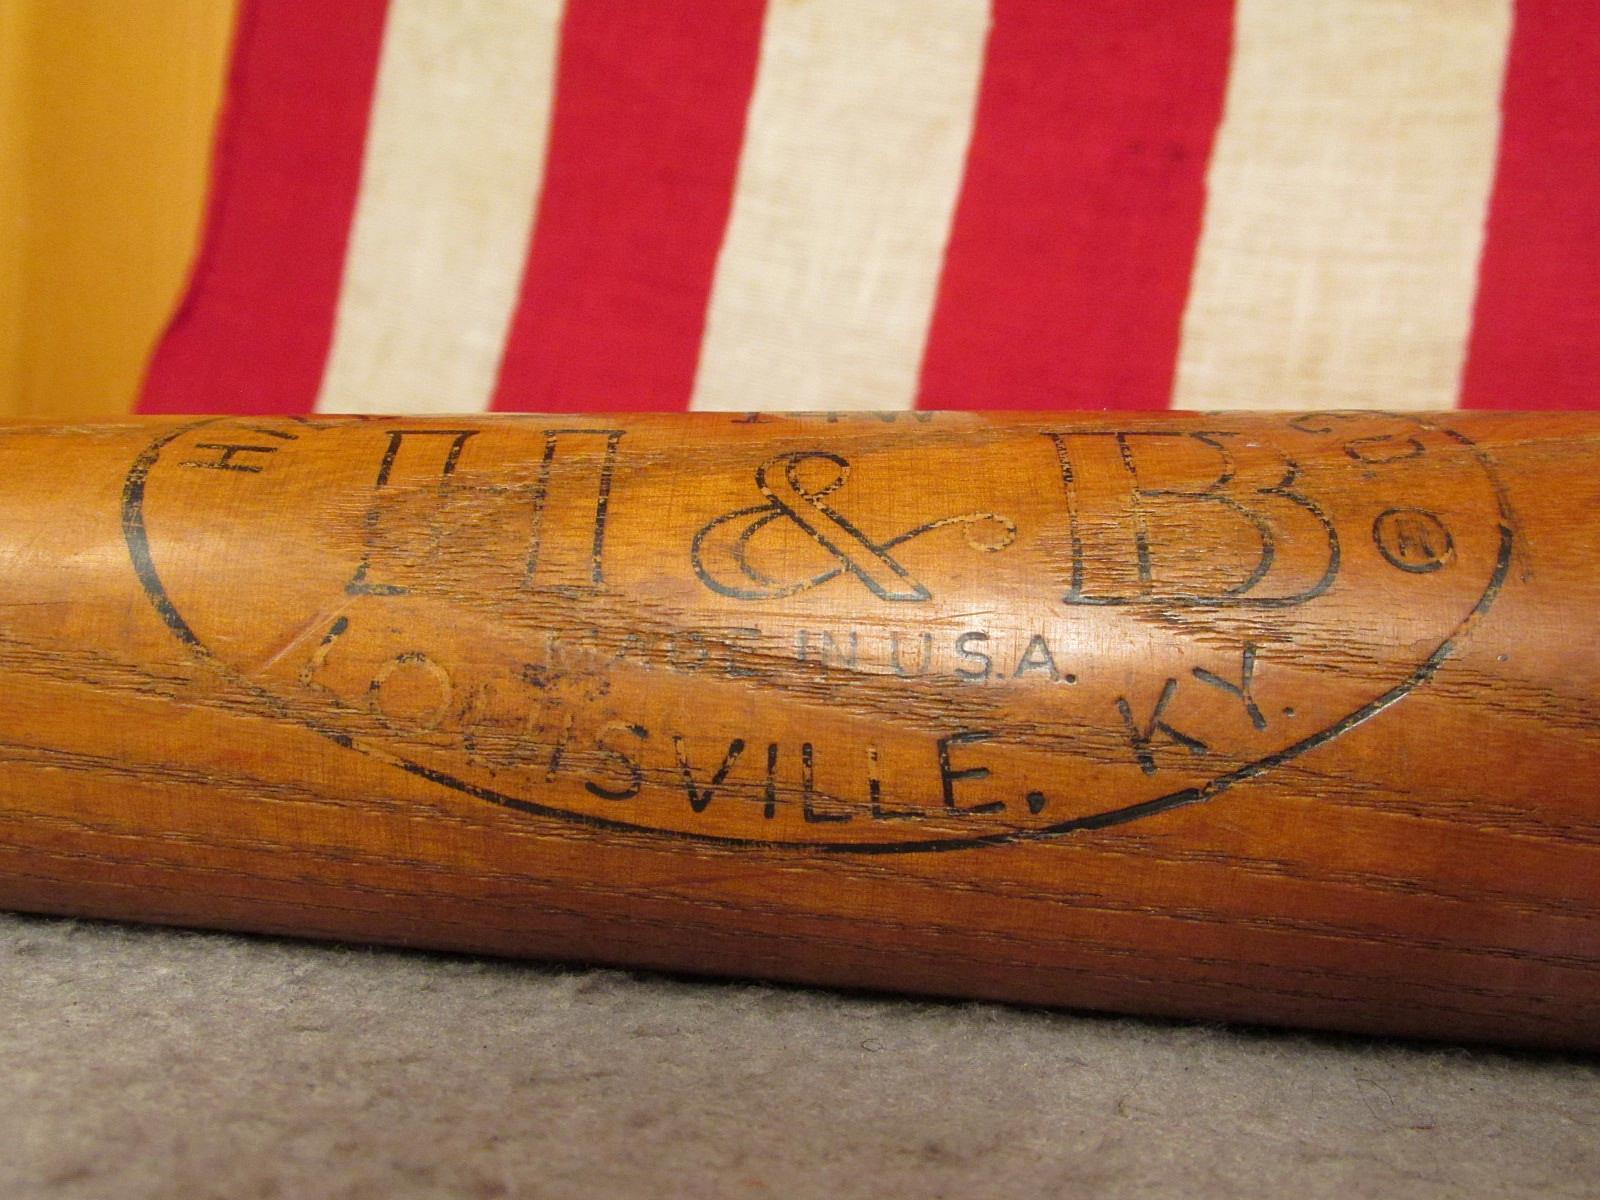 Vintage Hillerich & Bradsby Holz Baseball Baseball Baseball Schläger Sicher Hit Ed Mathews Modell 4c17db